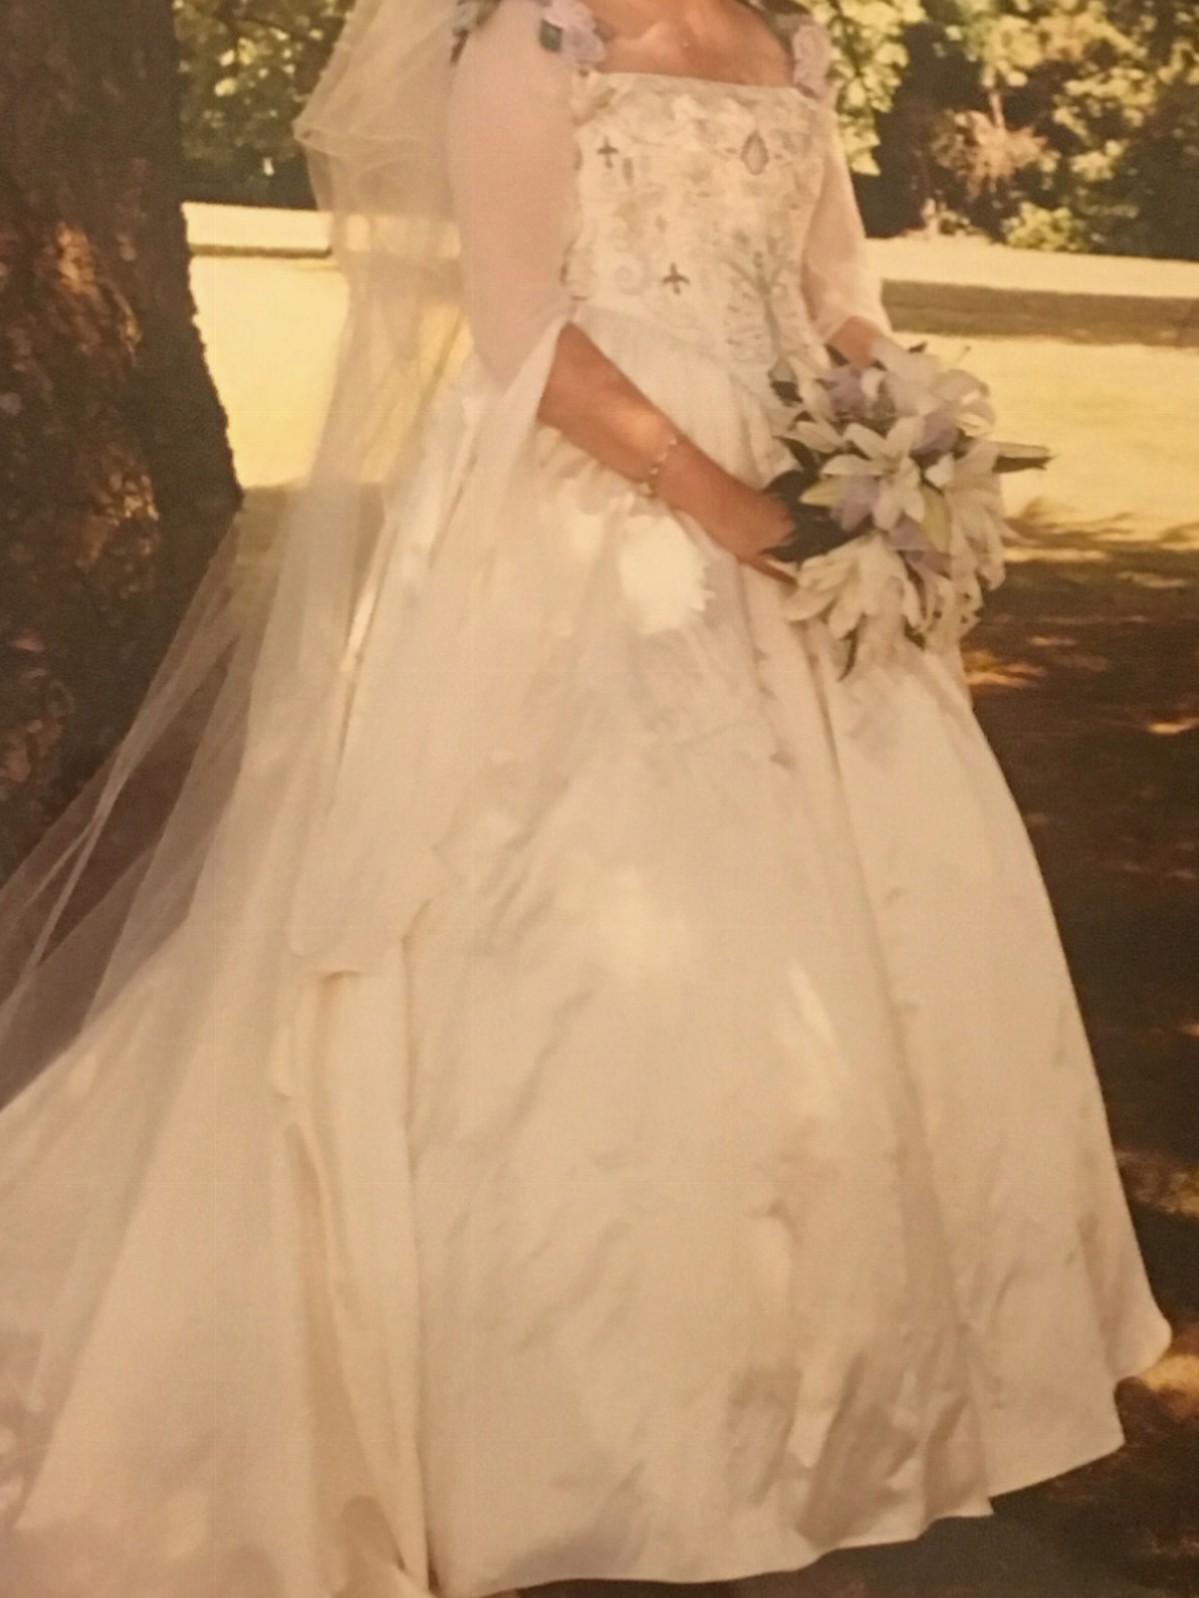 Nicki hill custom made second hand wedding dress on sale for Second hand wedding dresses san diego